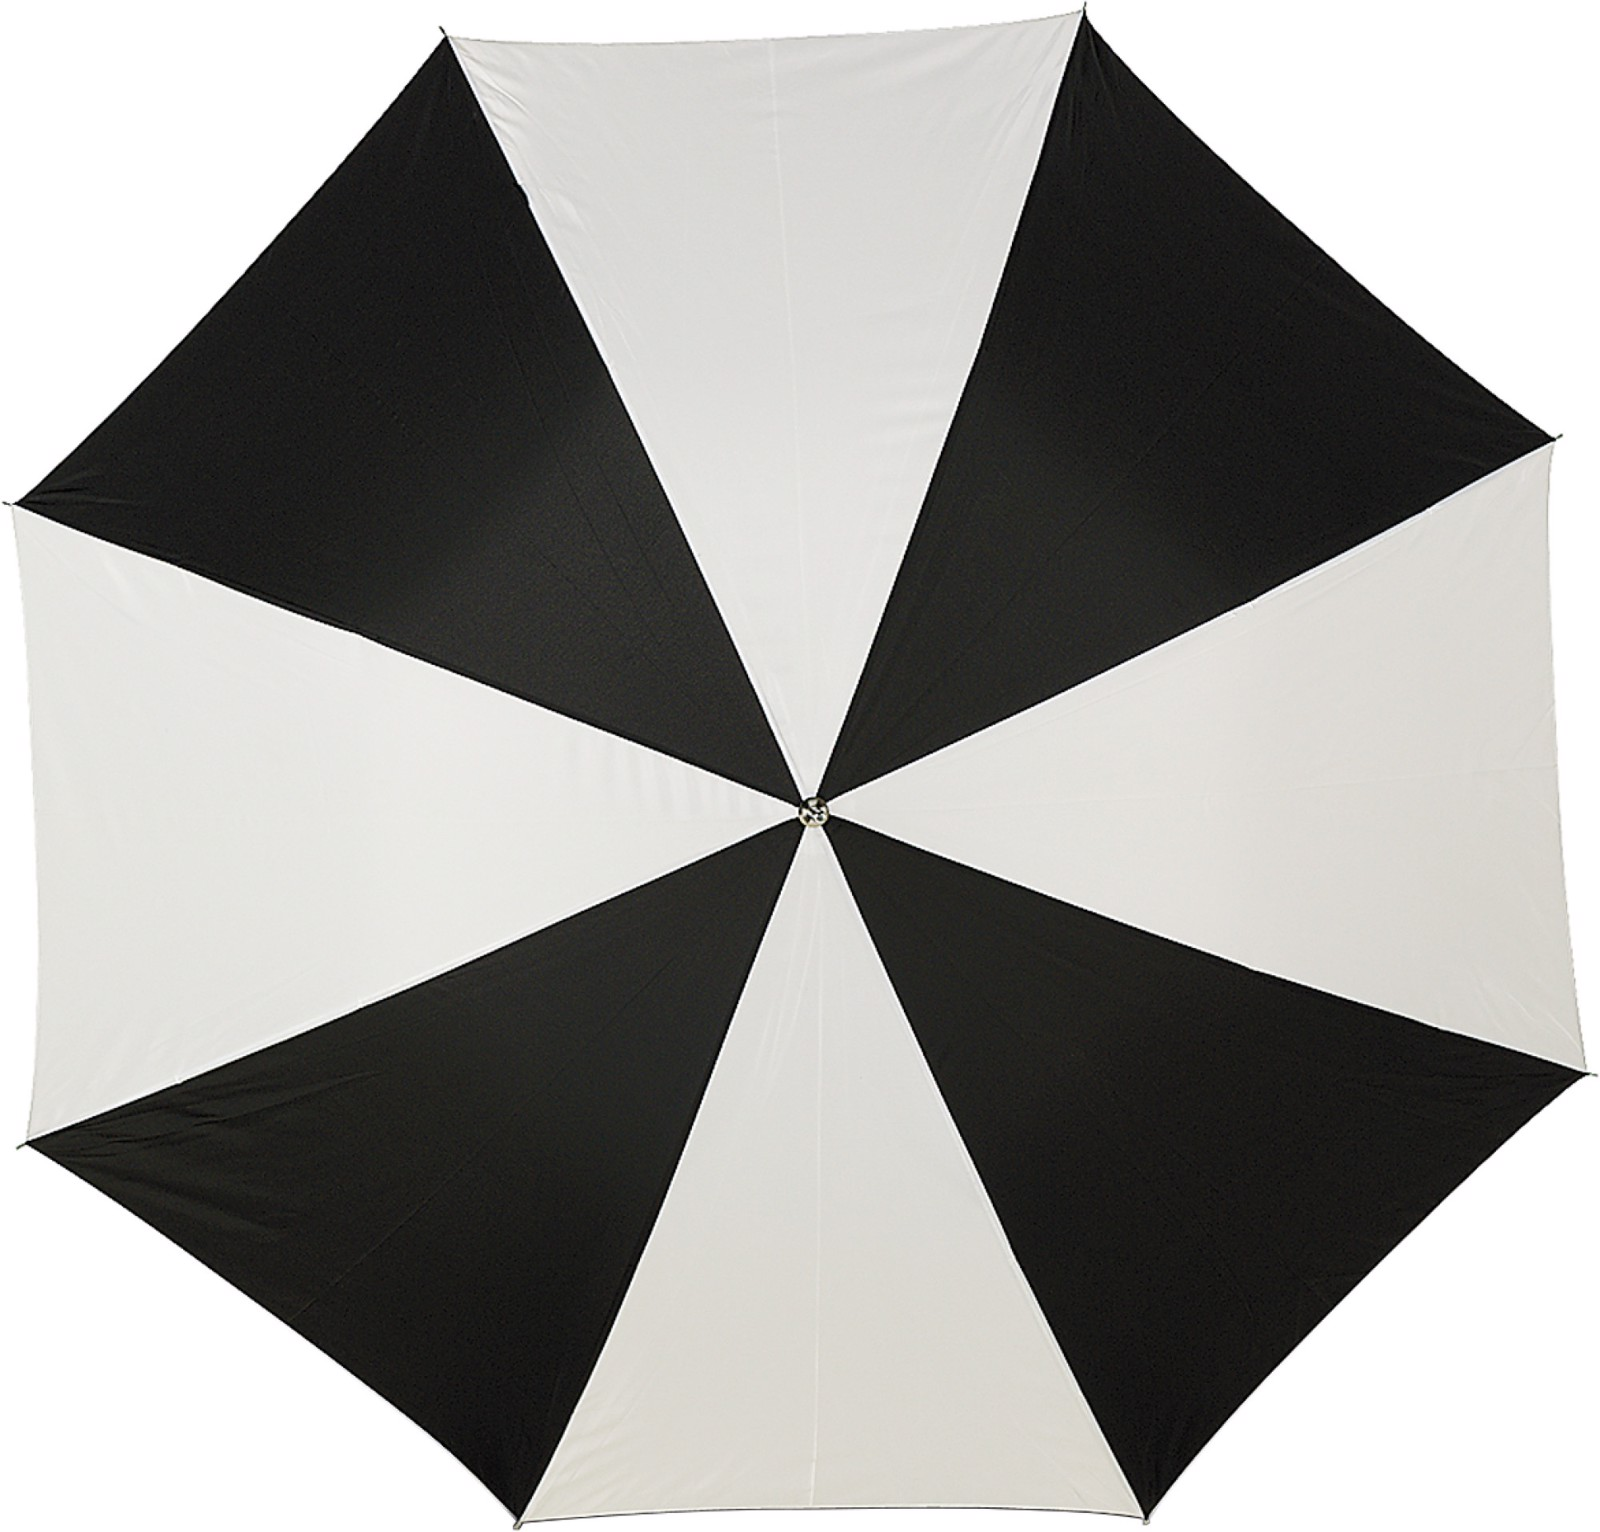 Polyester (190T) umbrella - Black / White